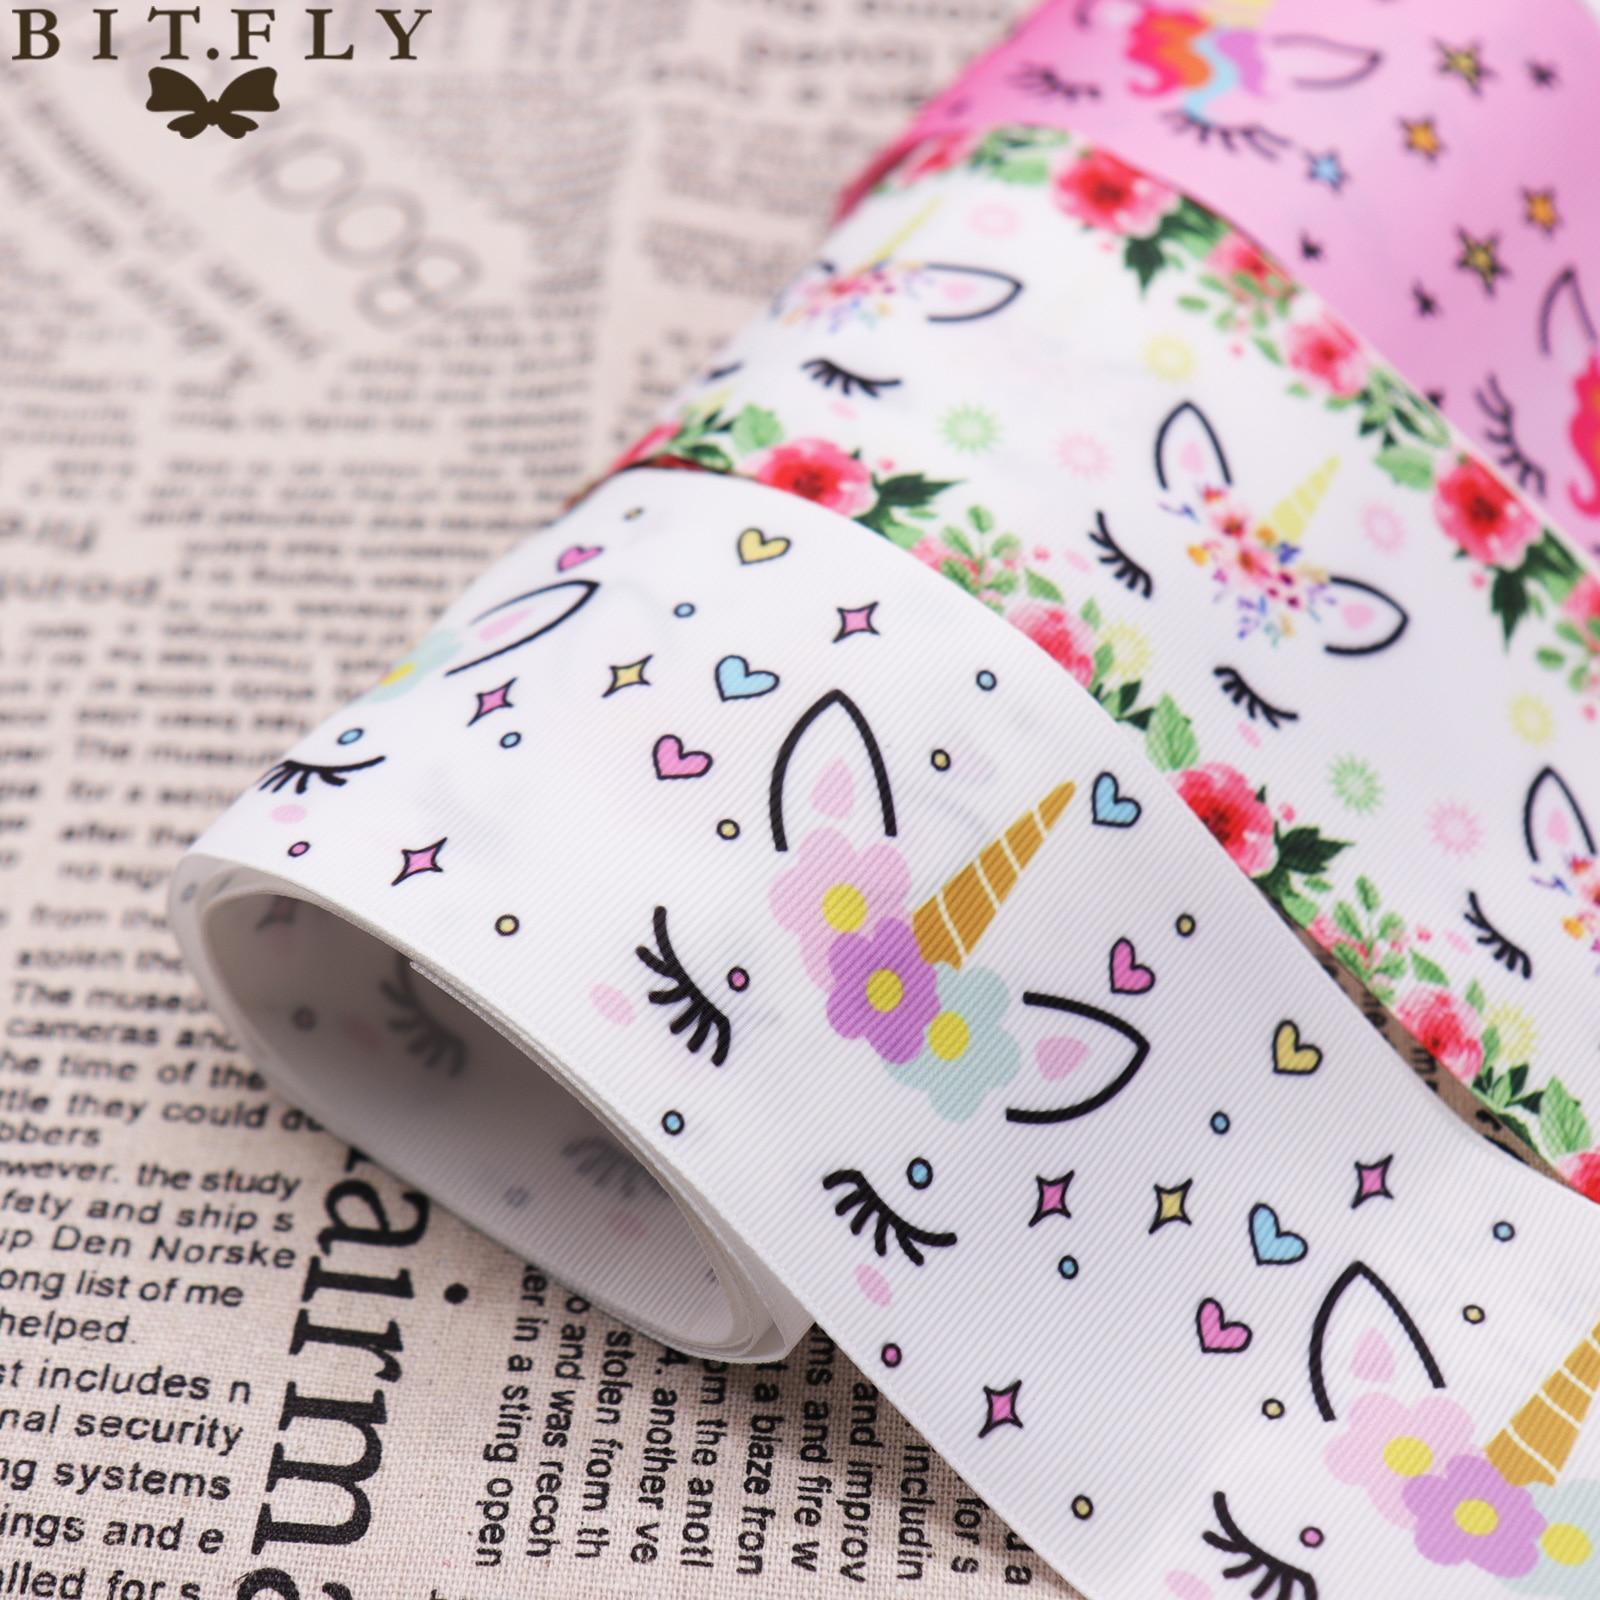 BIT.FLY 7.5cmx1Yard Cute Unicorn Printed Grosgrain Ribbon Wedding Unicorn Party Gift Wrapping Handmade  DIY Hair Accessories